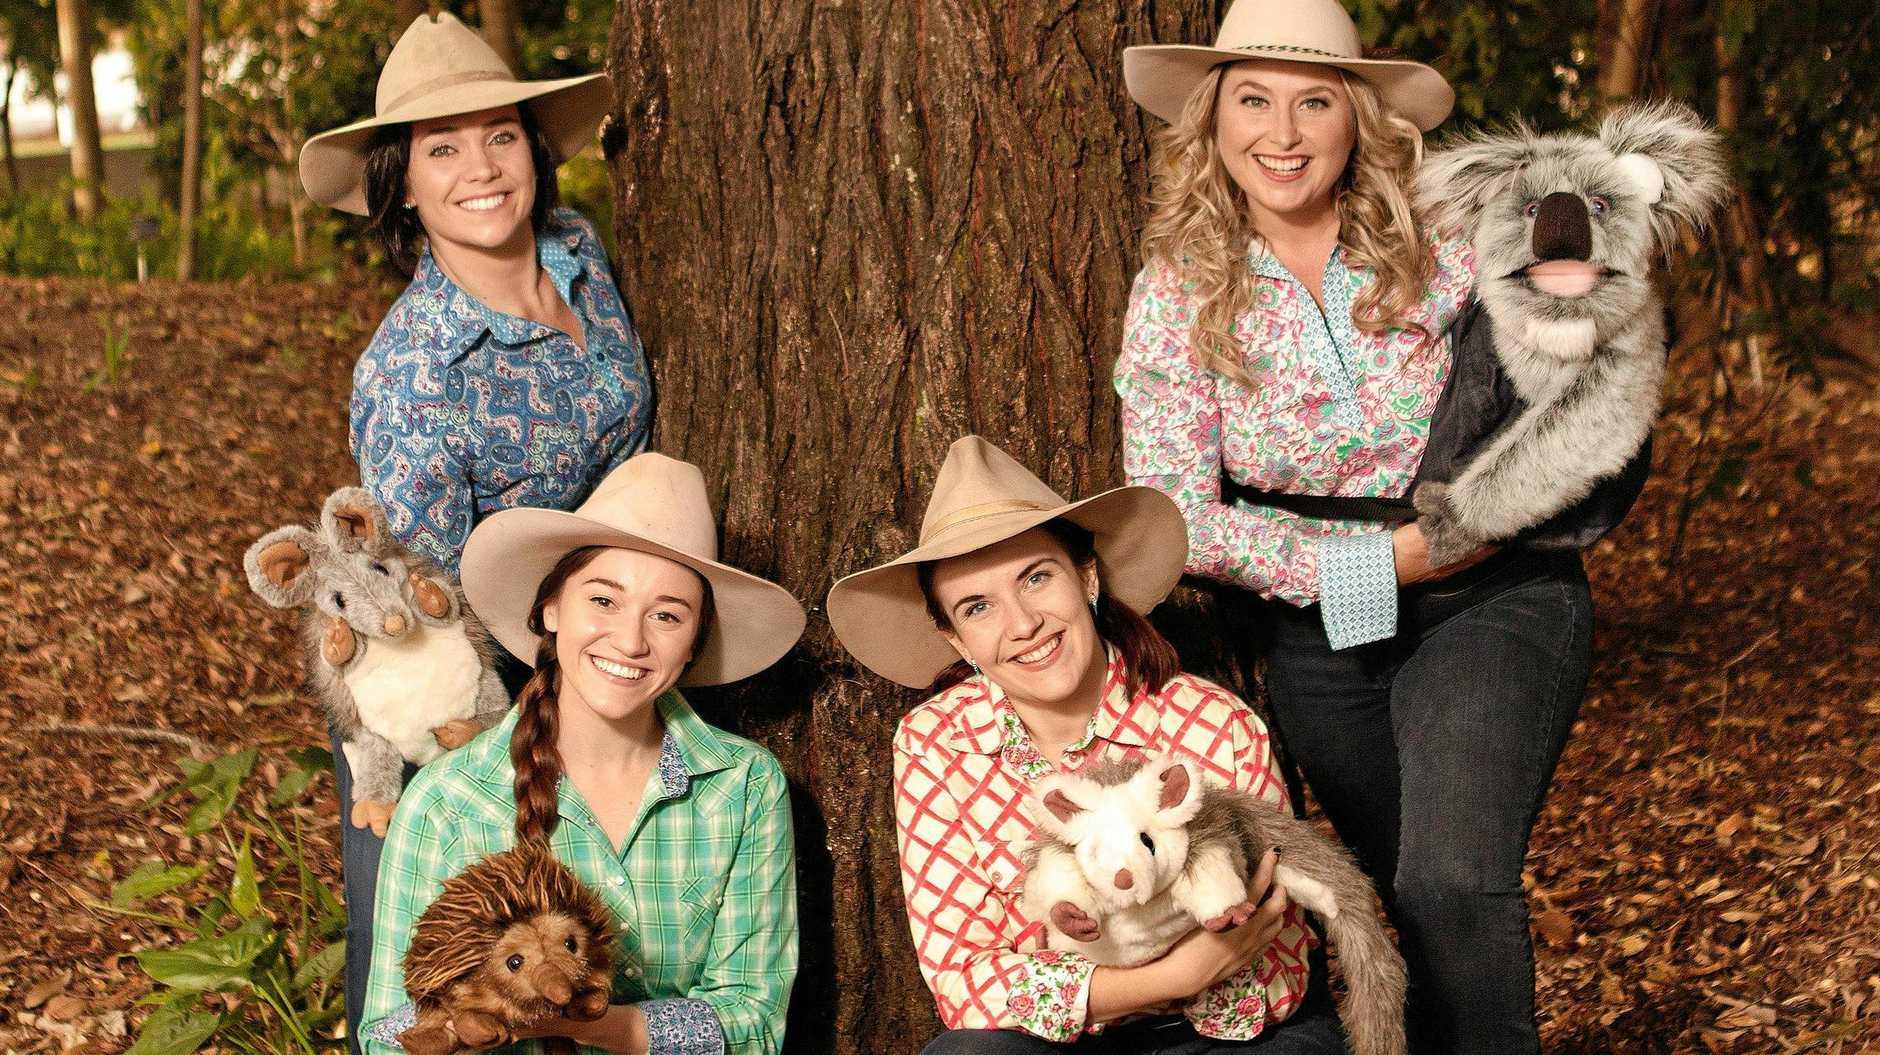 OUTBACK TEACHINGS:Joanna Heath, Georgia Spark, Cassie George and CIlla Pershouse from Blue Gum Farm TV.